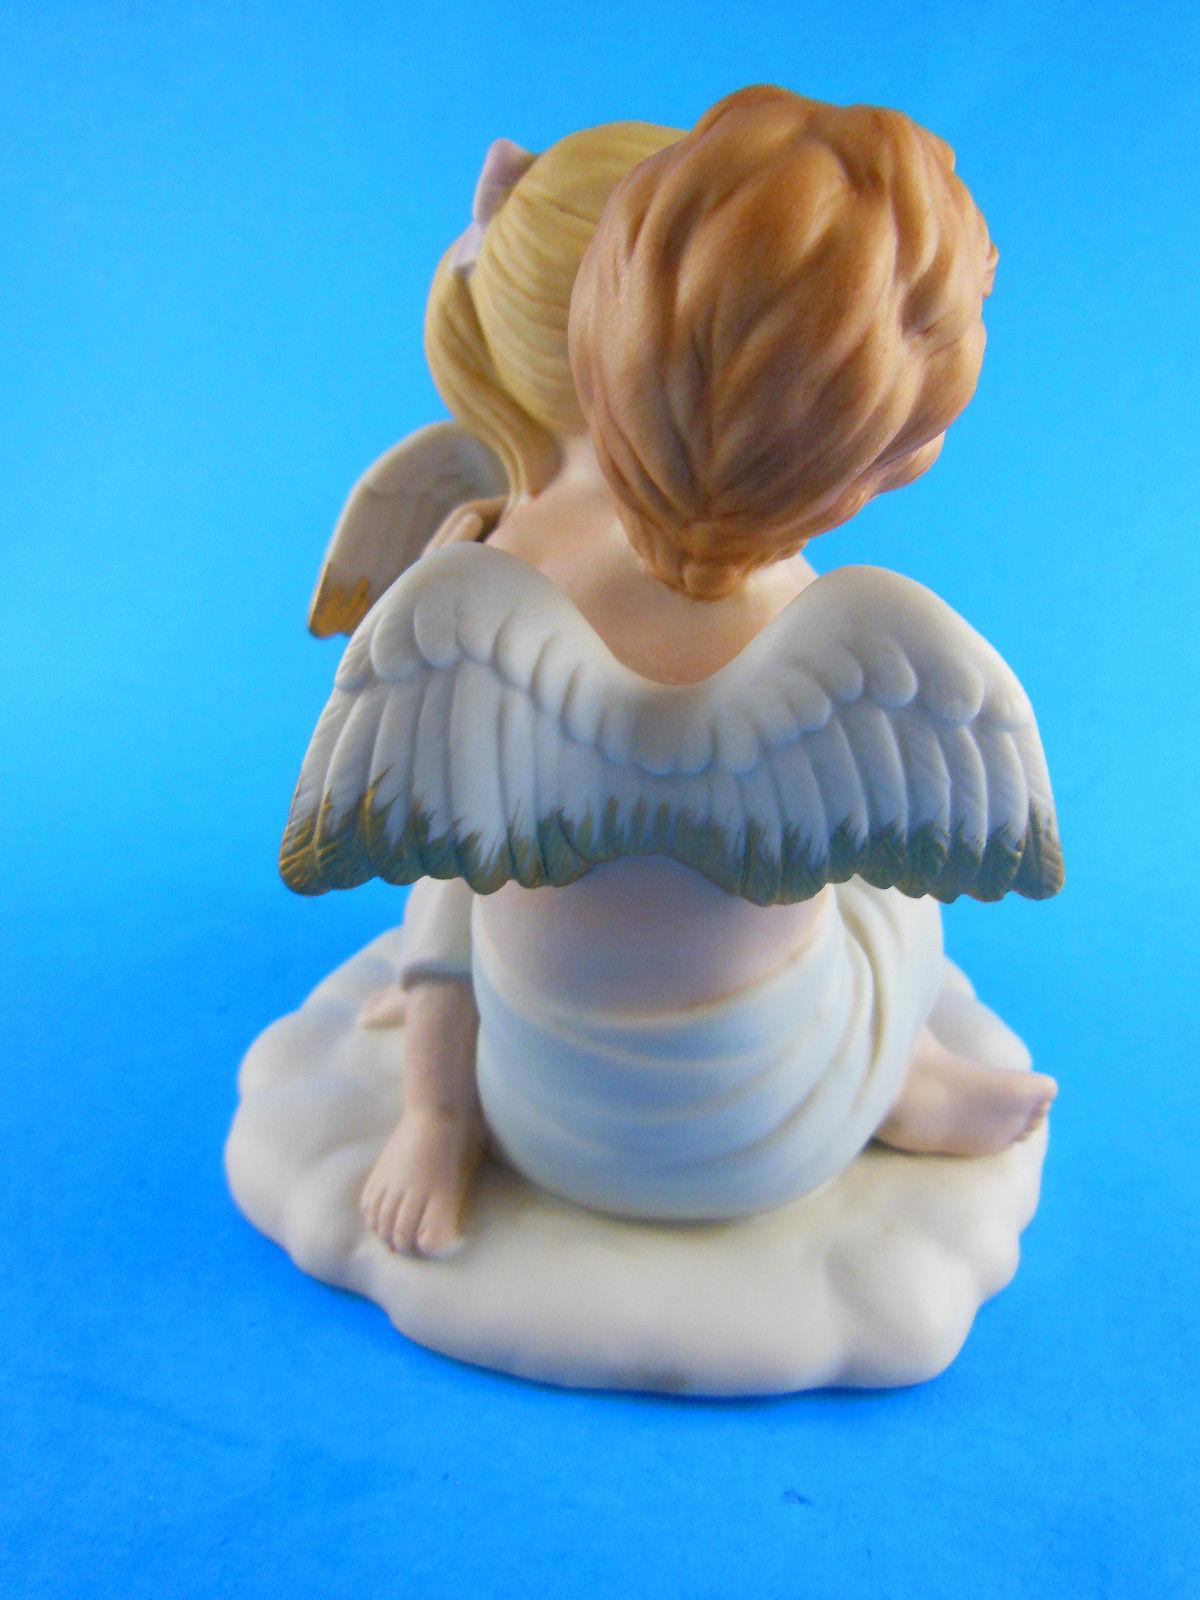 Home interiors homco bisque porcelain and 12 similar items Home interiors figurines homco